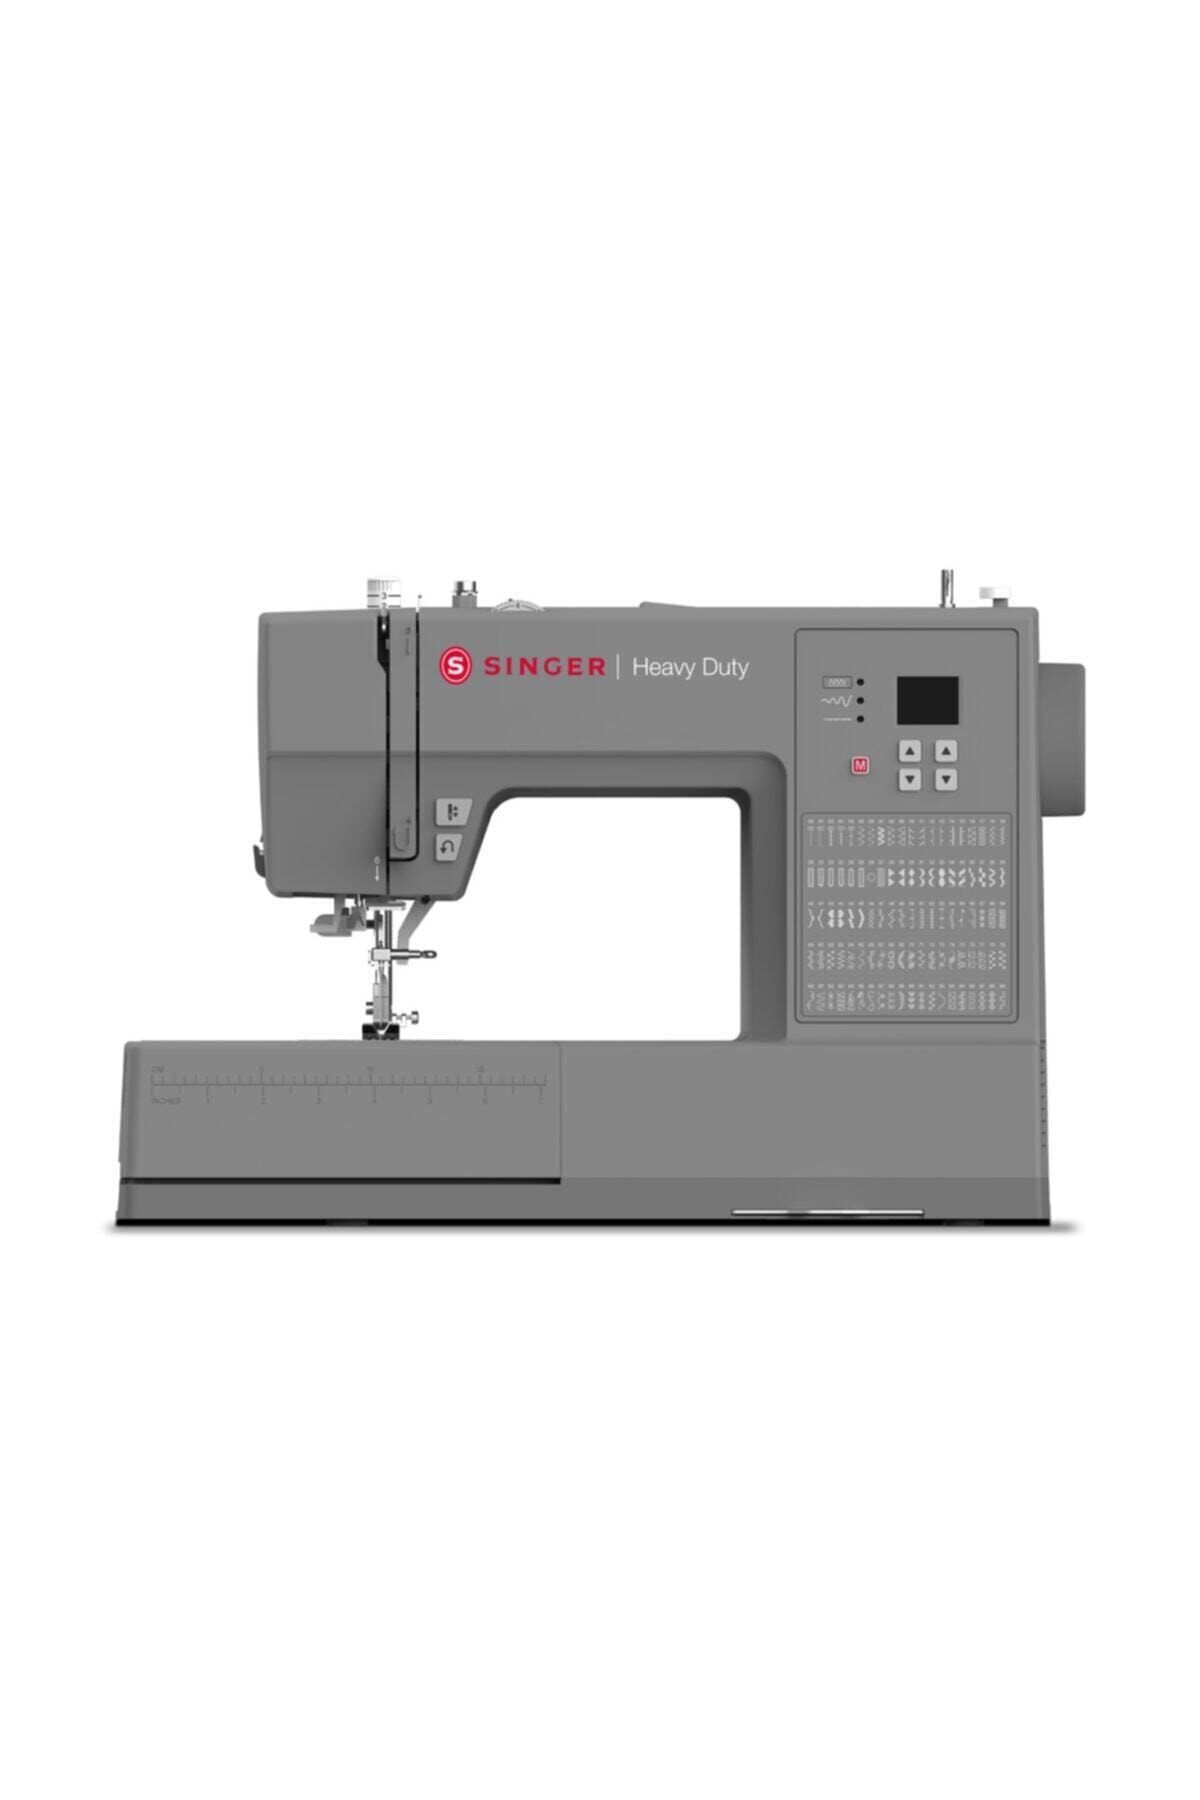 Elektronik Piko Ve Dikiş Makinesi Hd6605